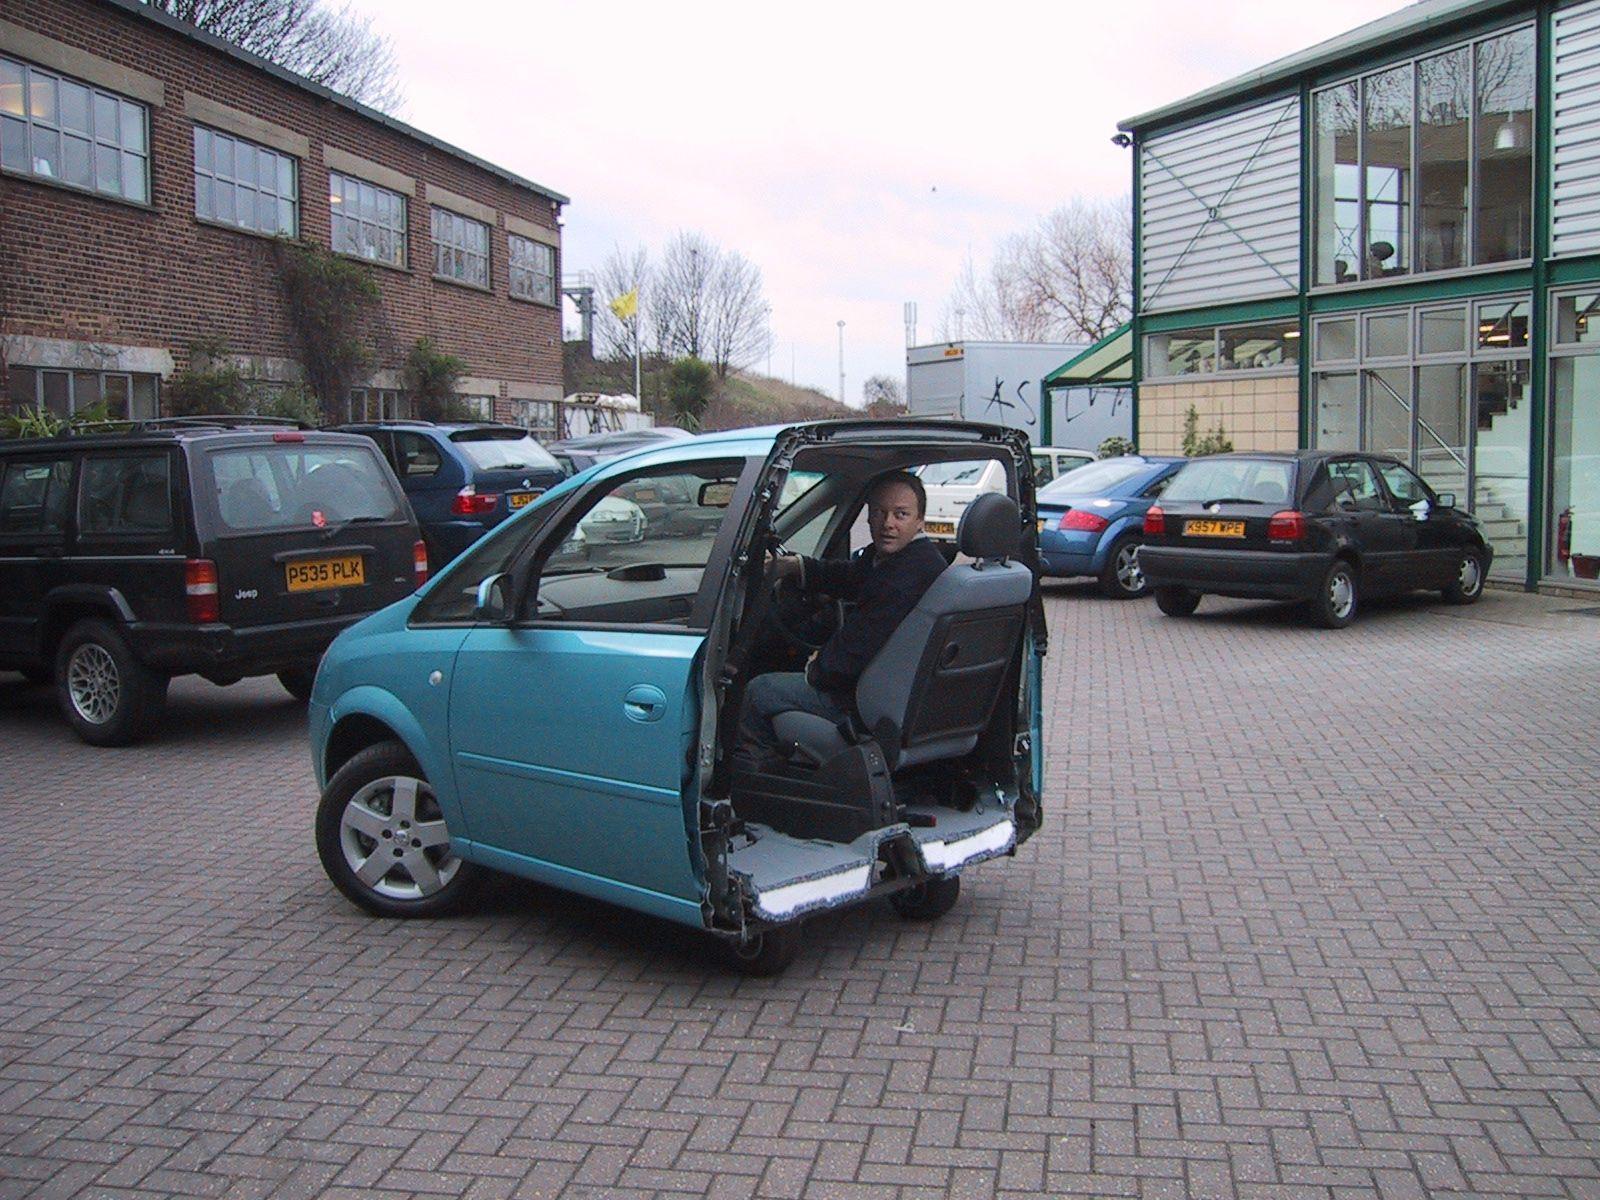 Vauxhall Meriva Electric Split Car Asylum S Fantastic Vehicles